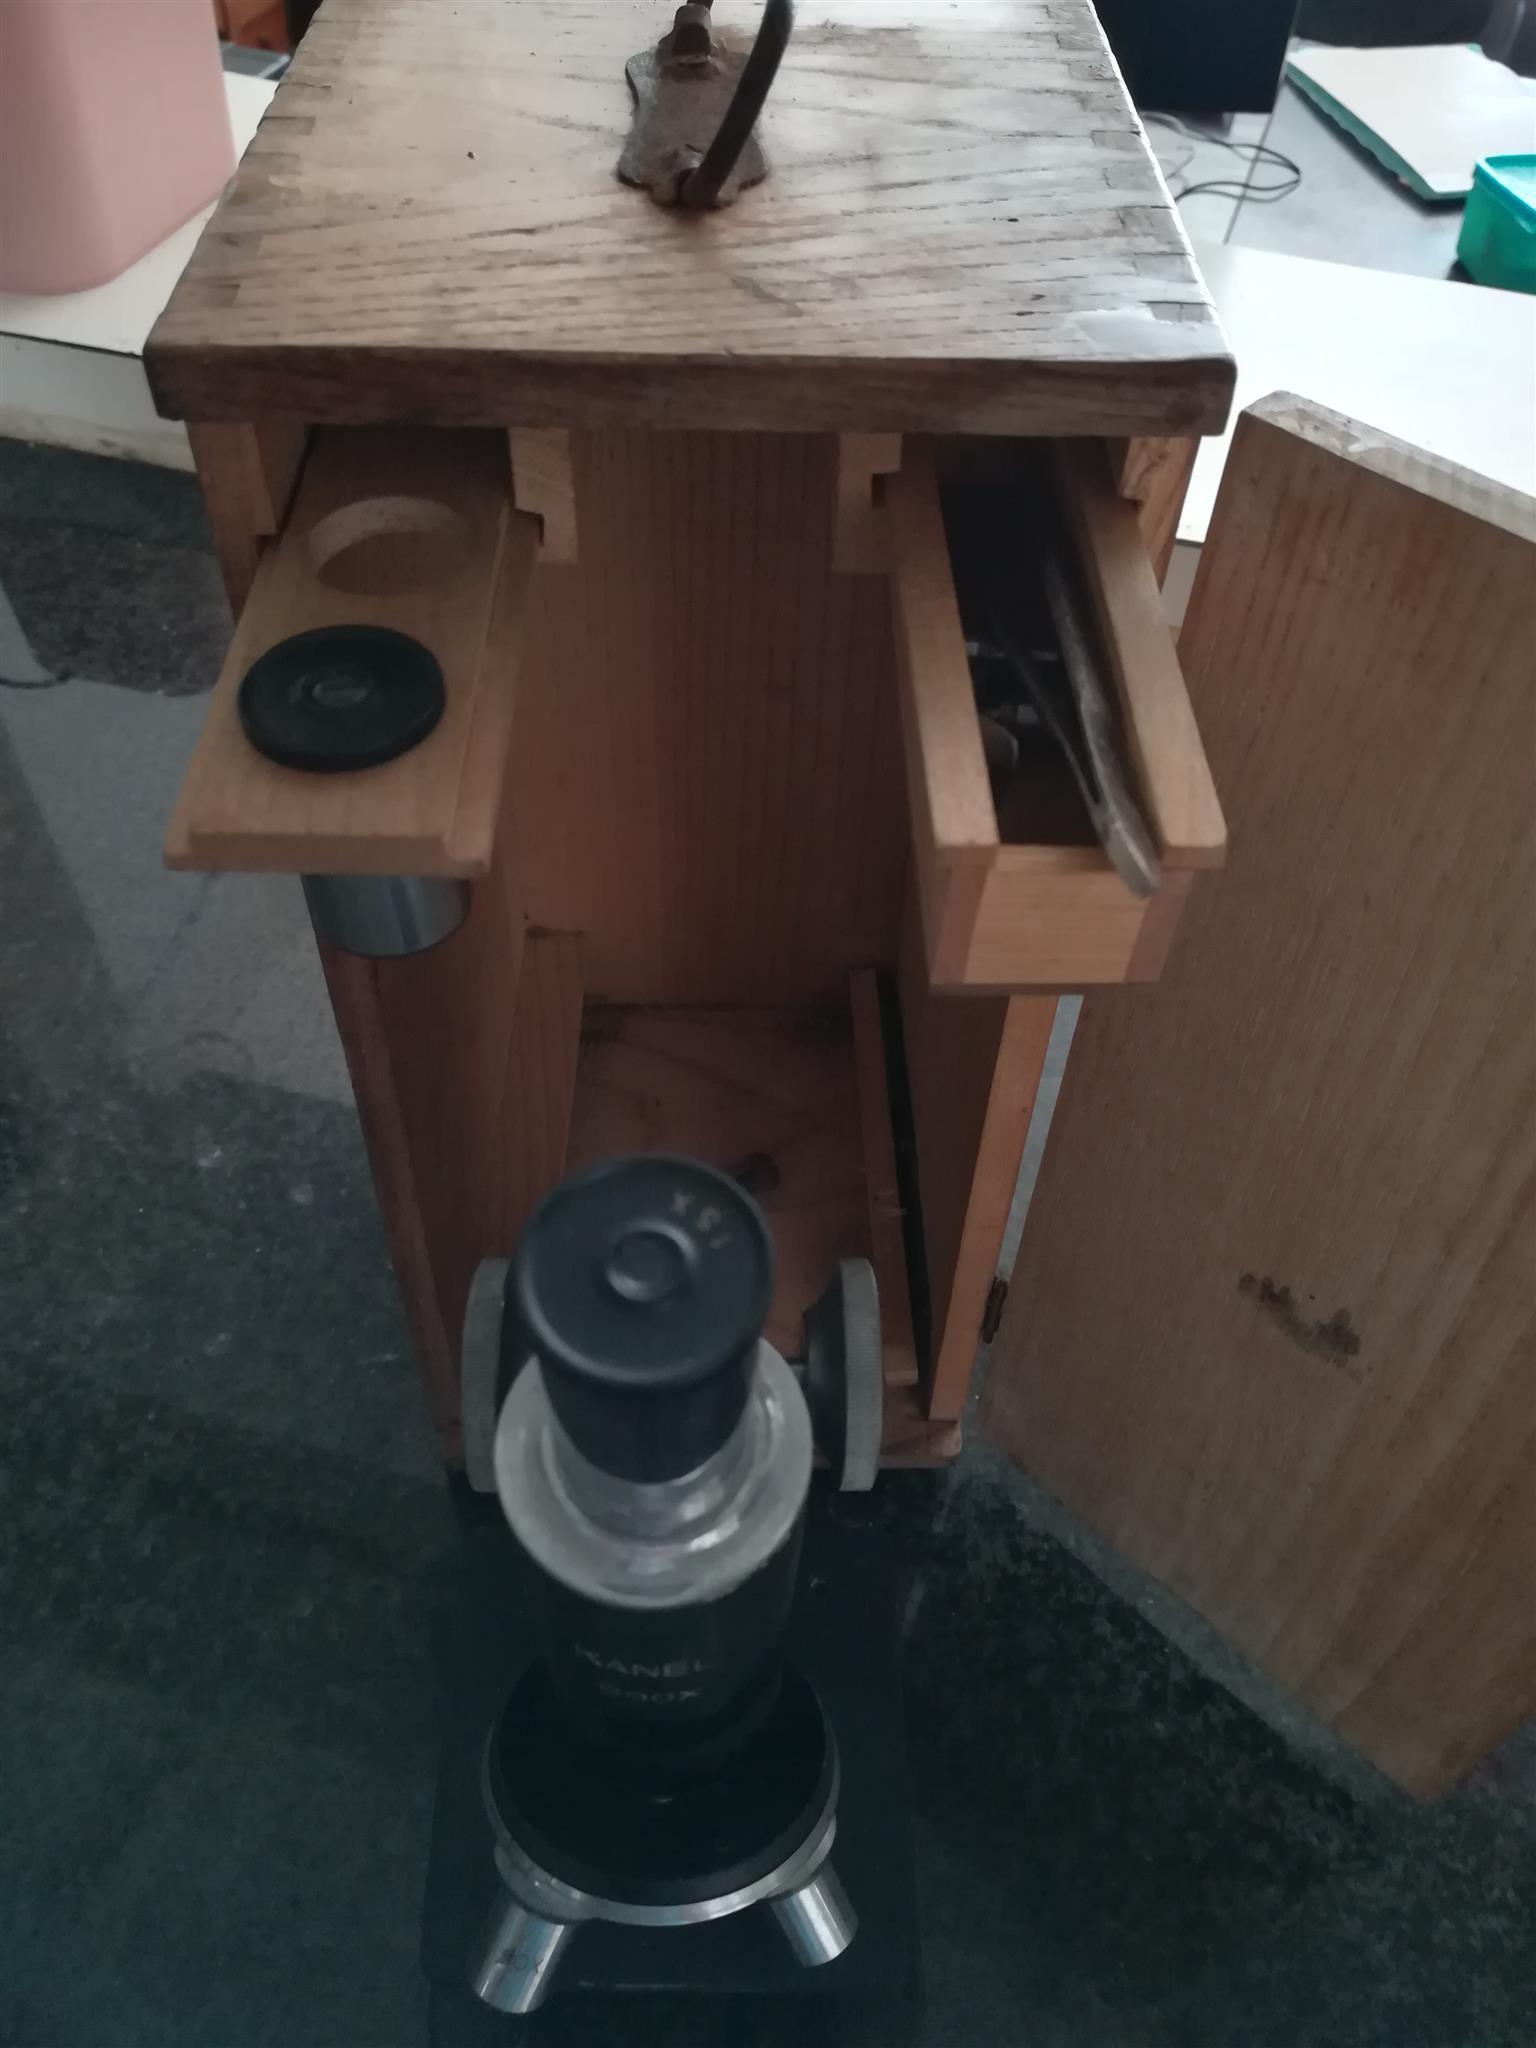 Kanel 600 Vintage microscope